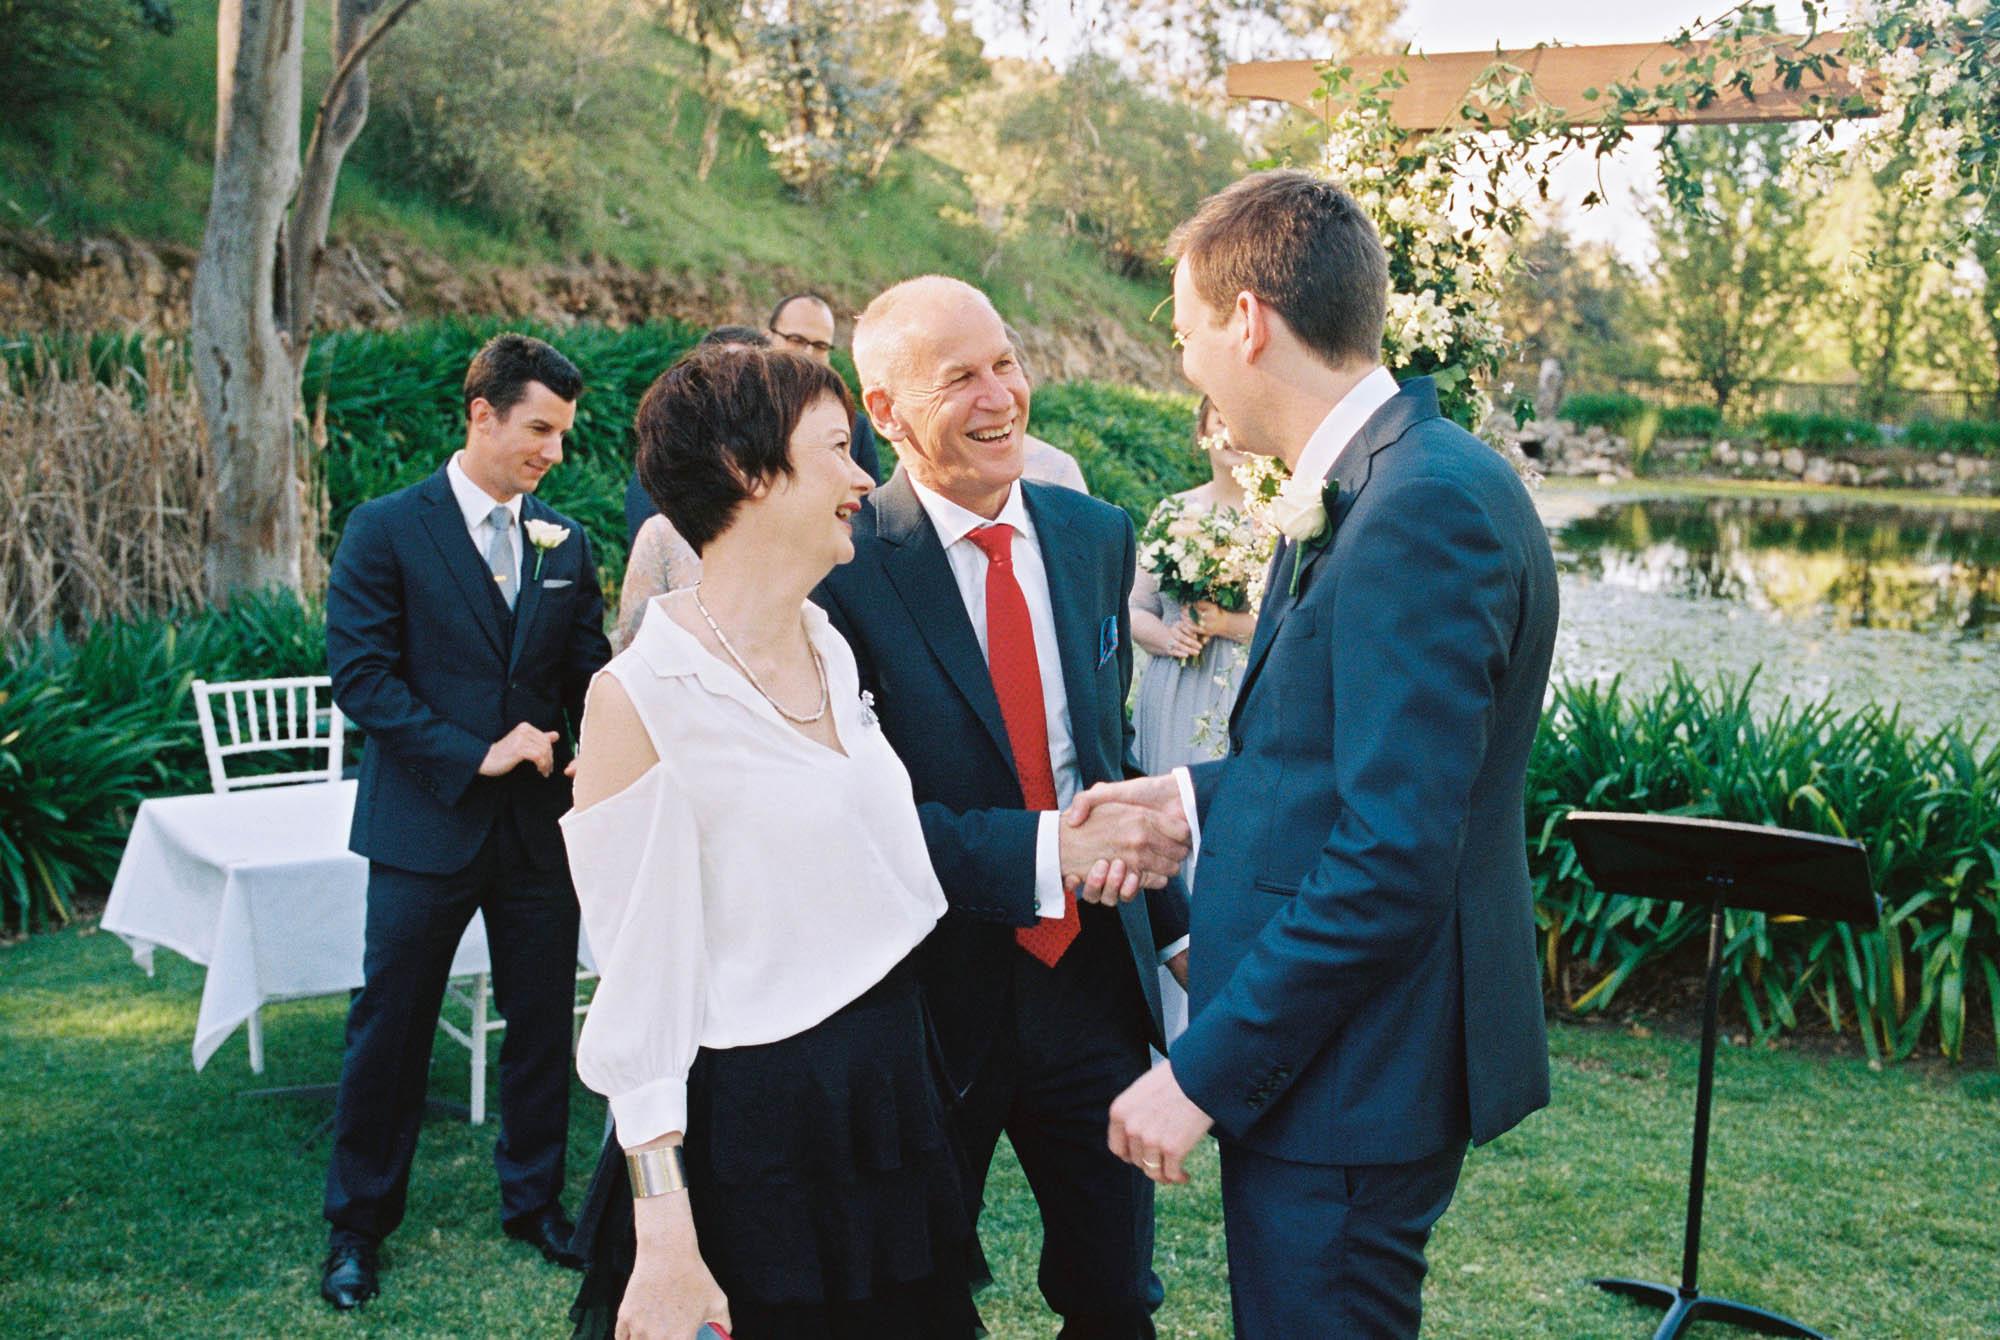 Glen-Ewin-Estate-wedding-photography-053.jpg